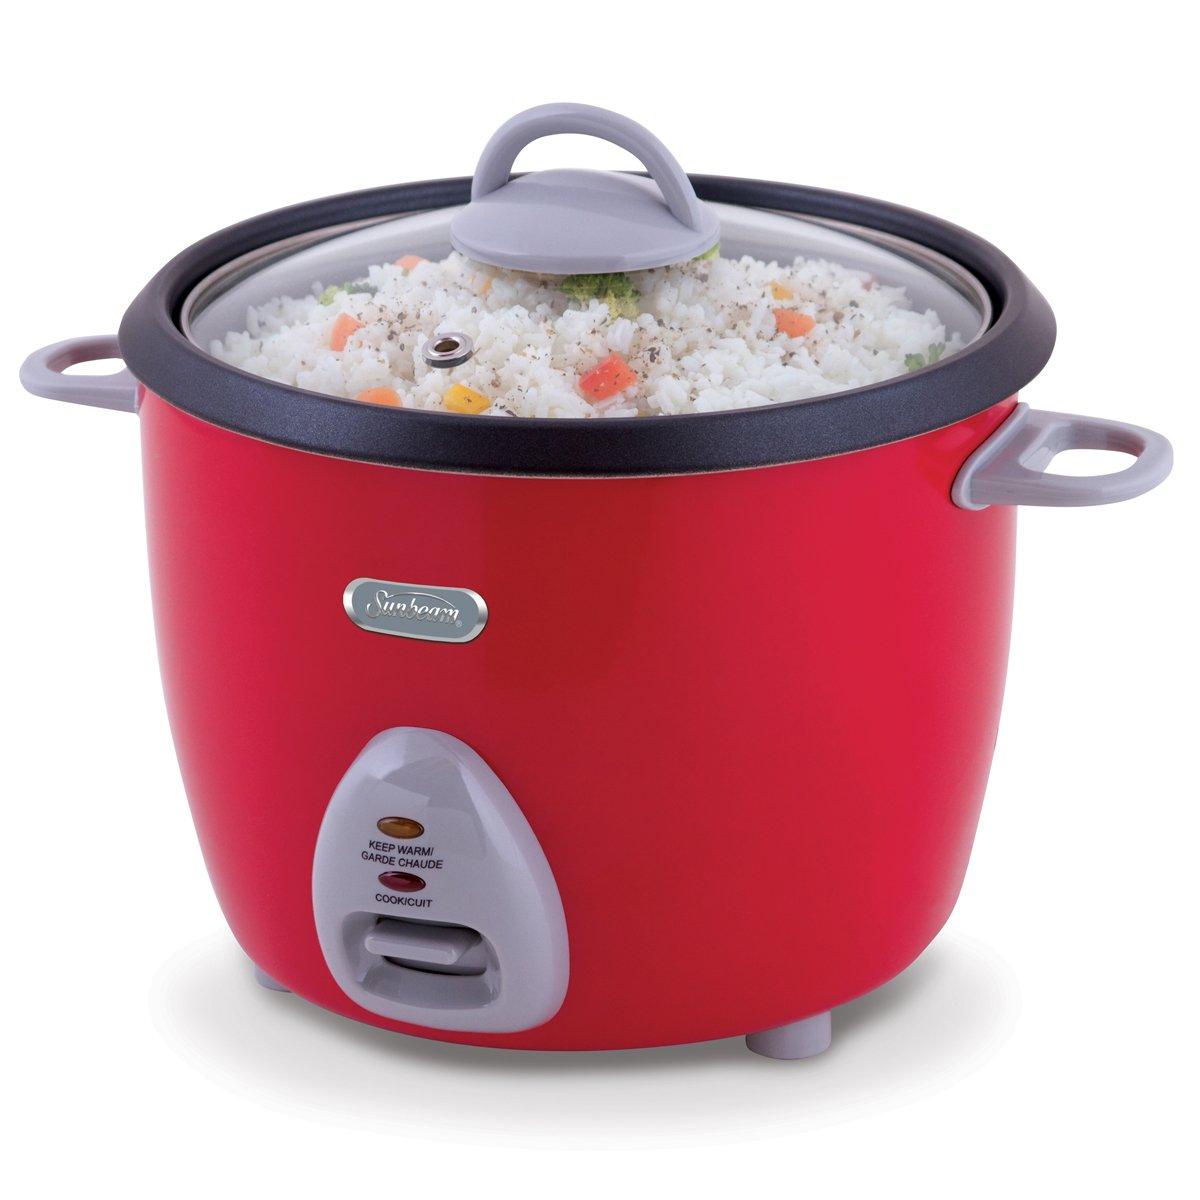 Sunbeam® 16 Cup Multi-Purpose Manual Rice Cooker